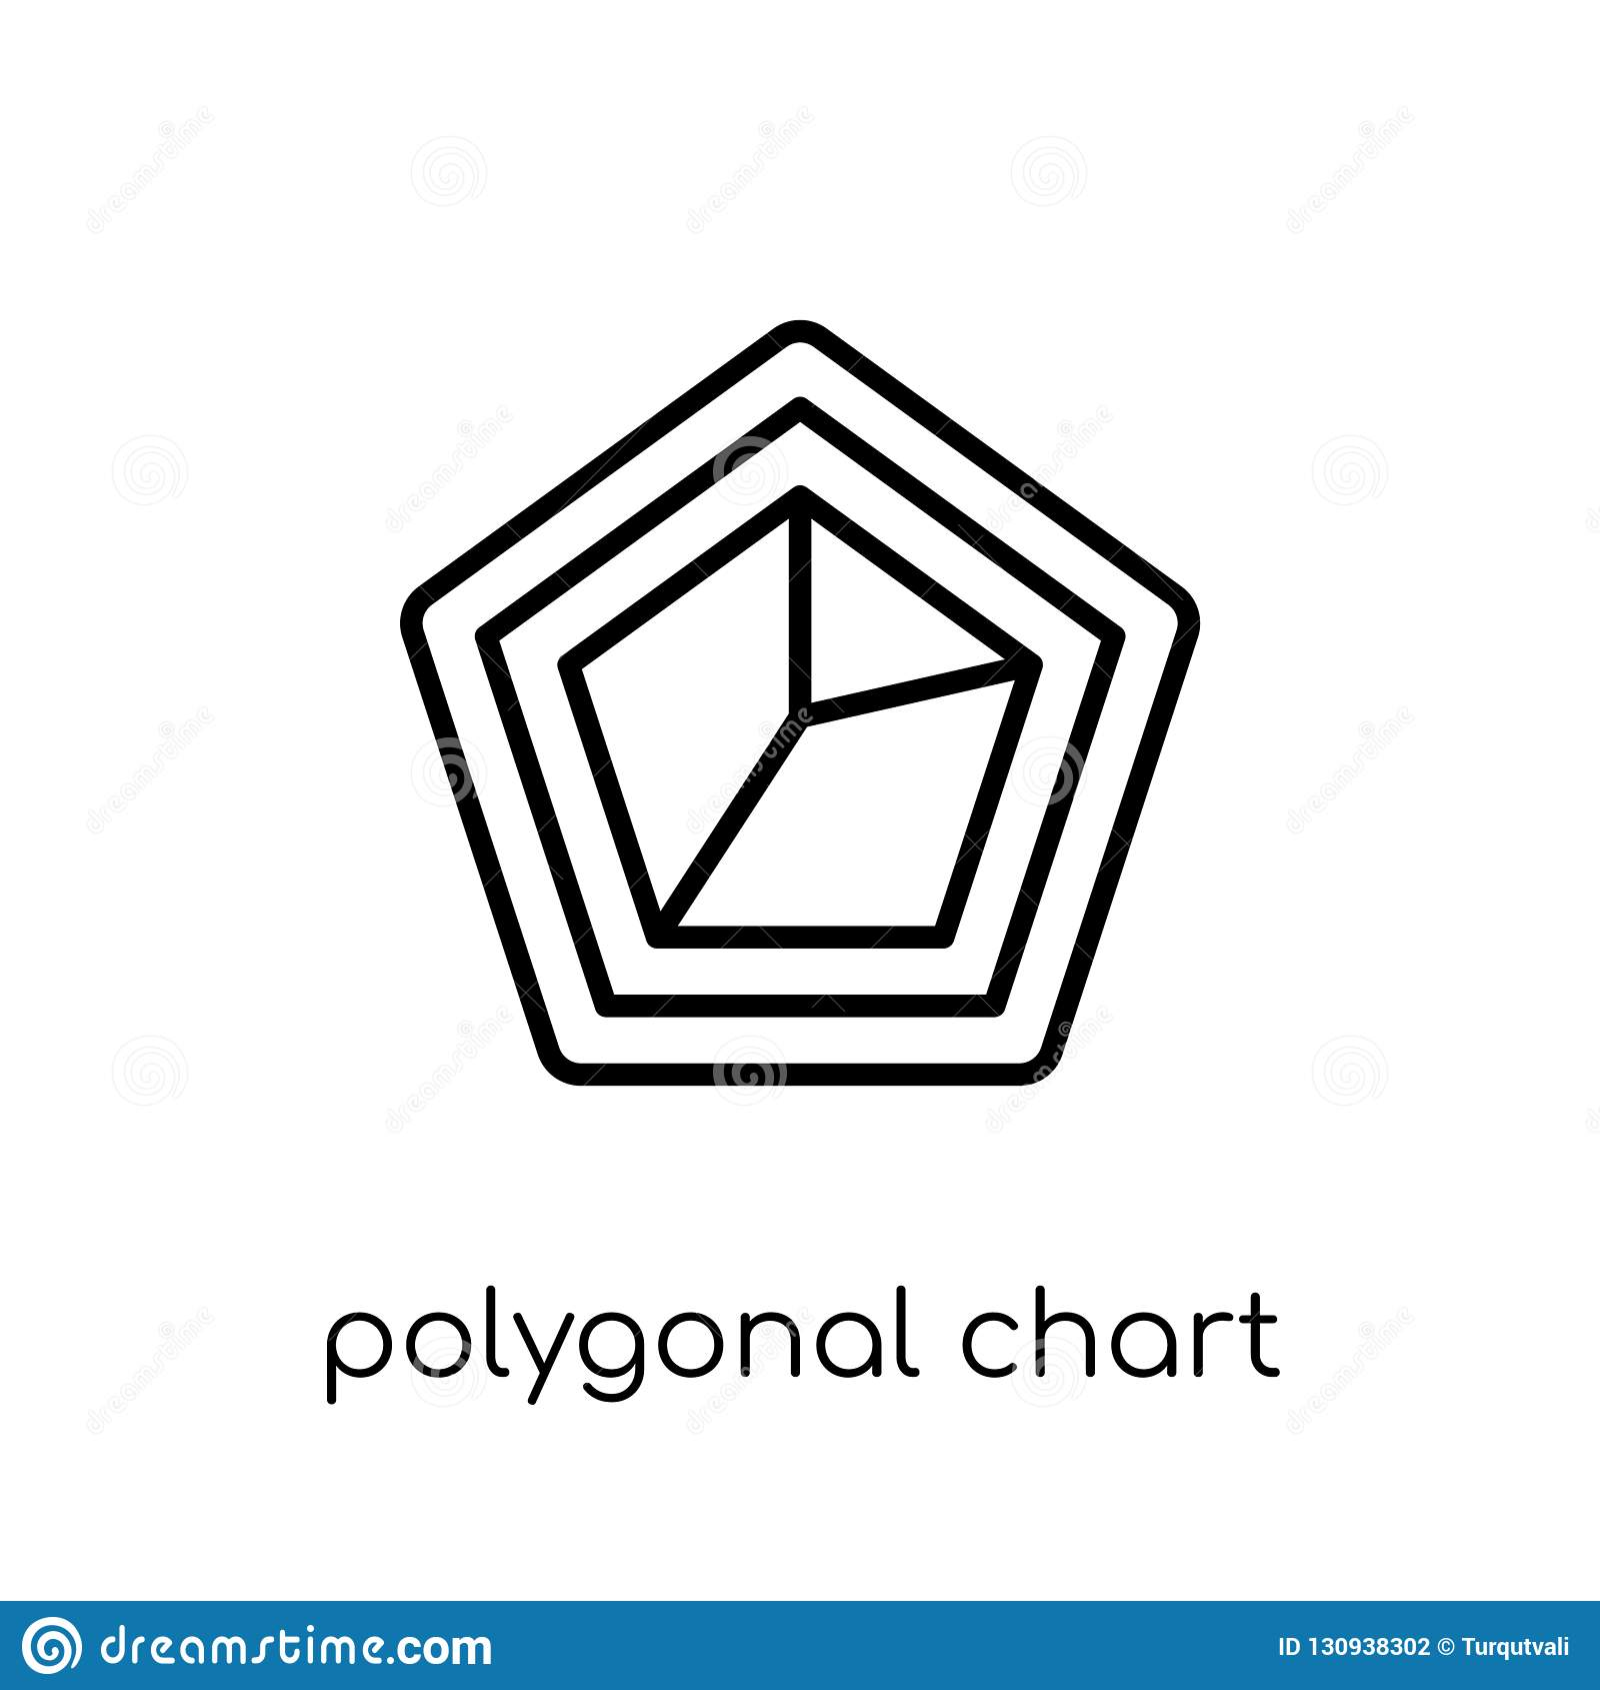 Ícone poligonal da carta Vetor linear liso moderno na moda poligonal